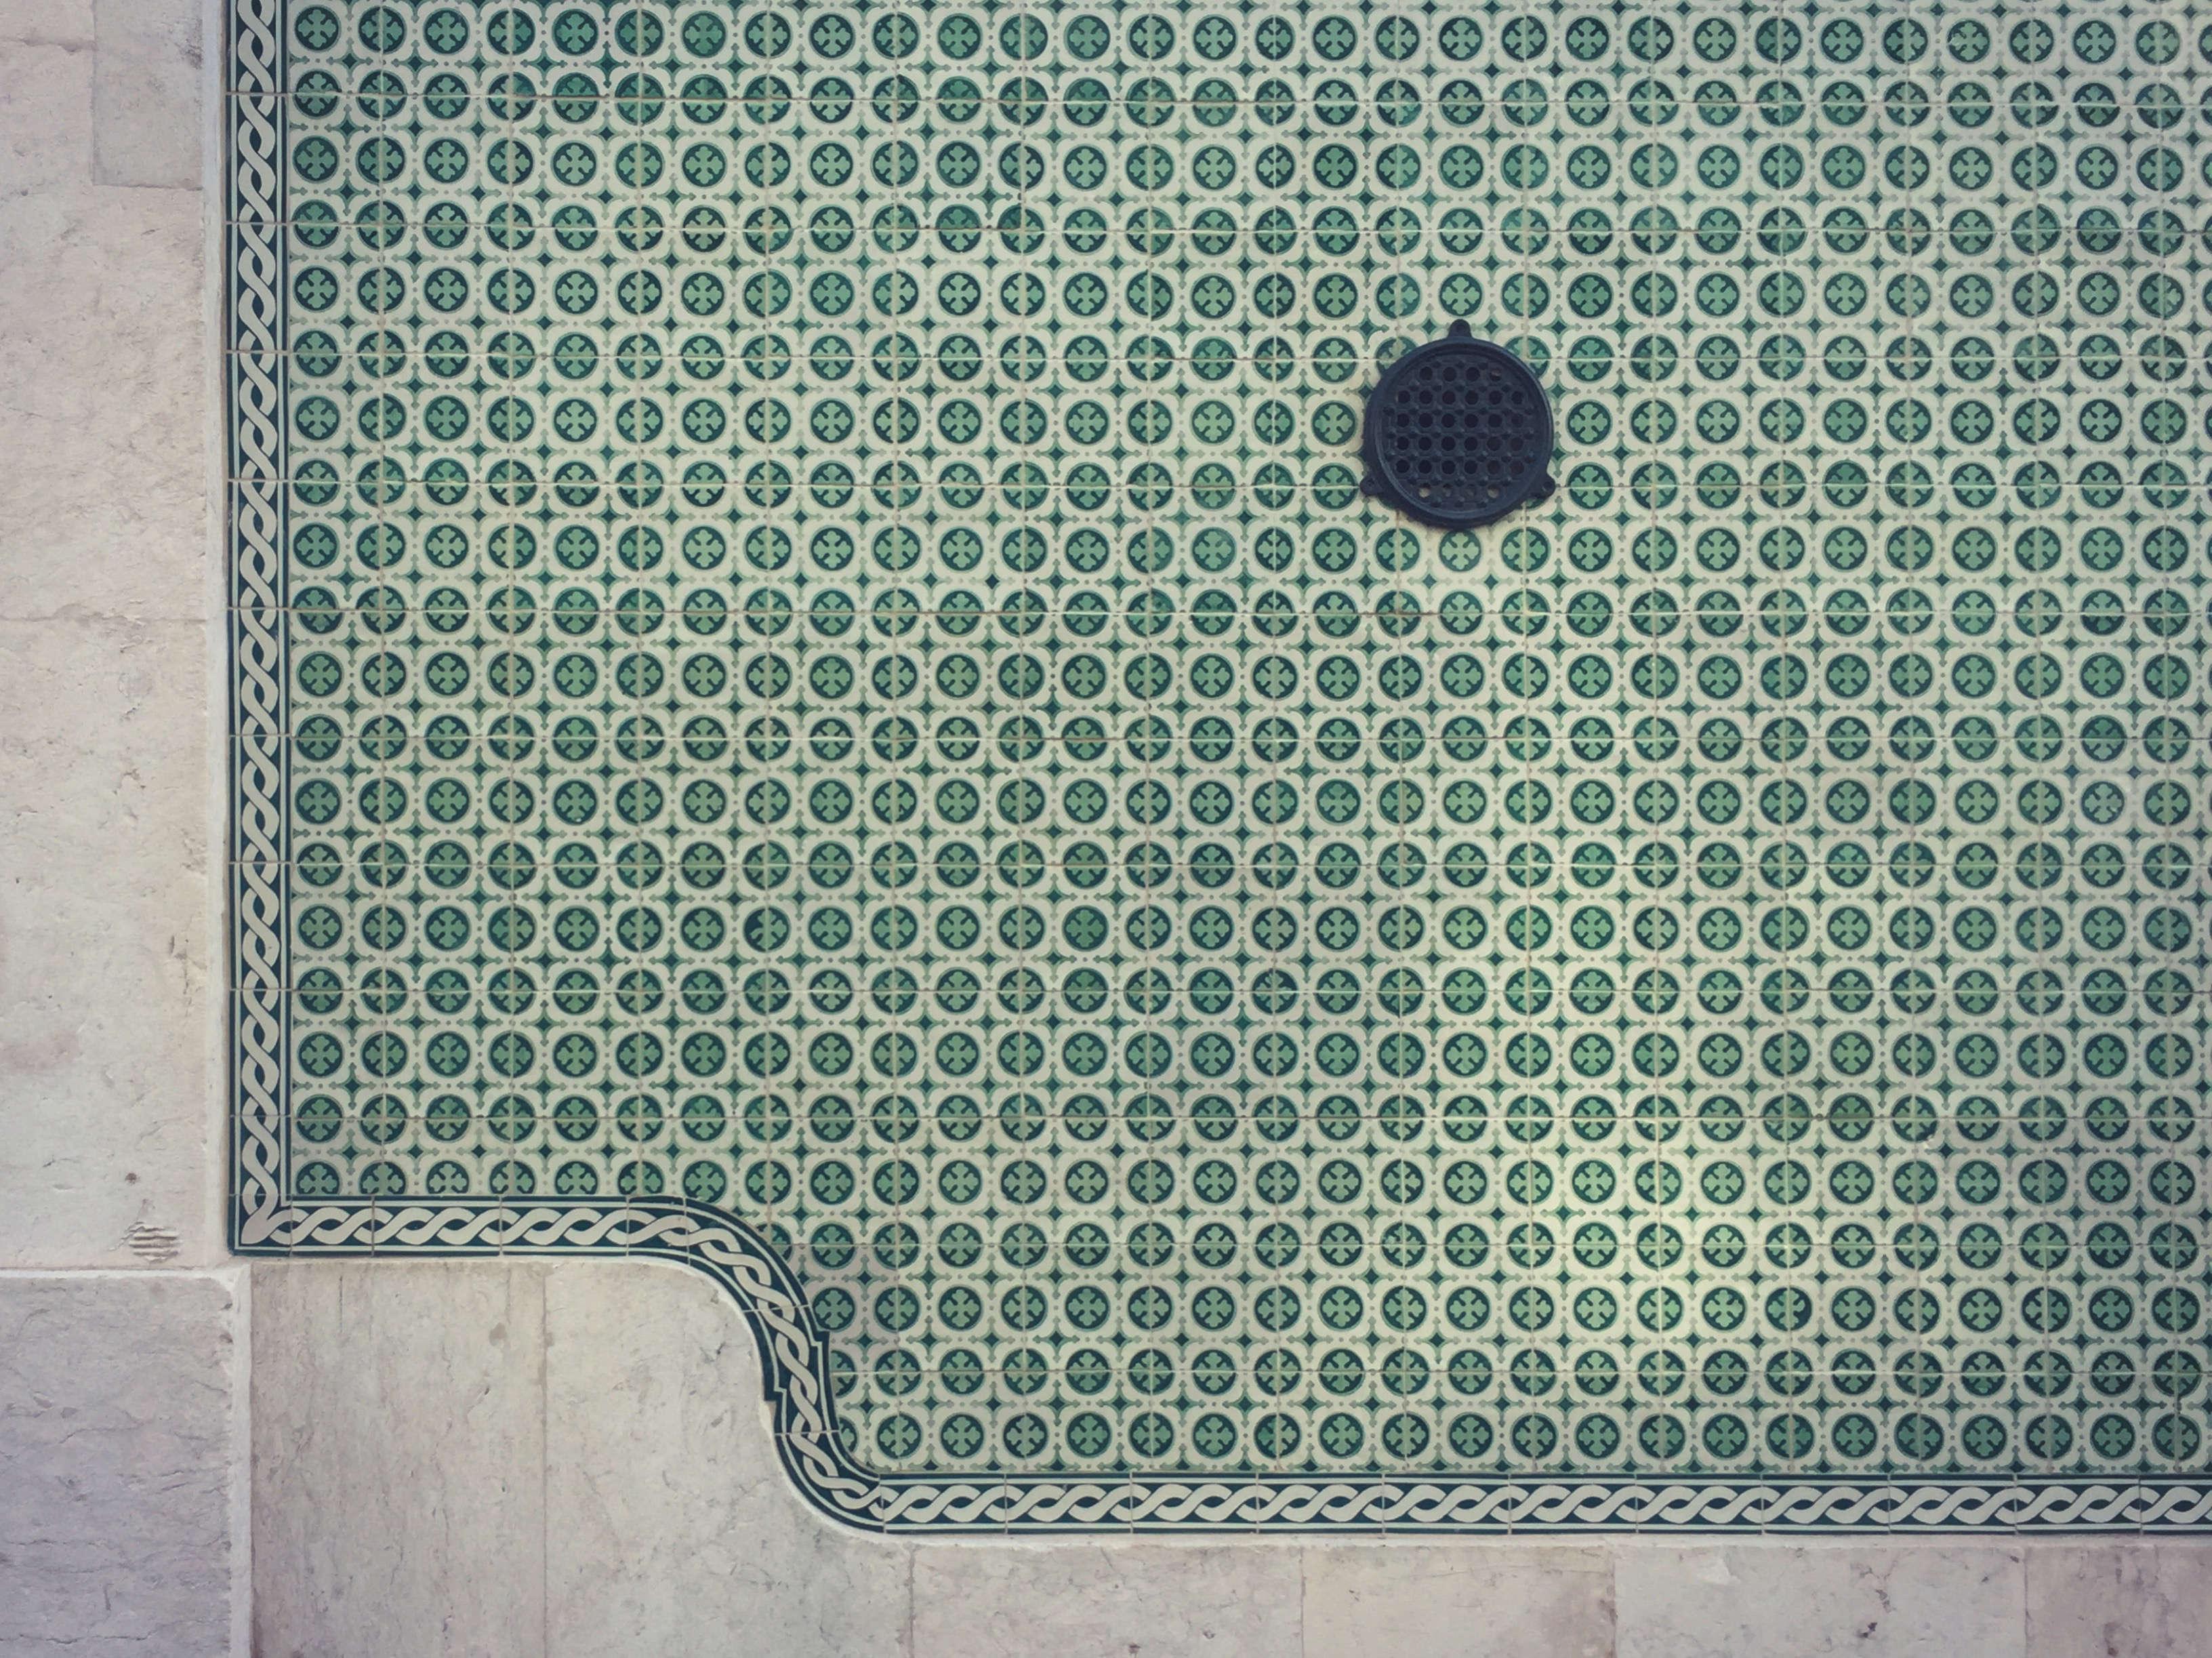 tiles similar to everett &blue&#8\2\17;salfamadesigncreate a ri 13